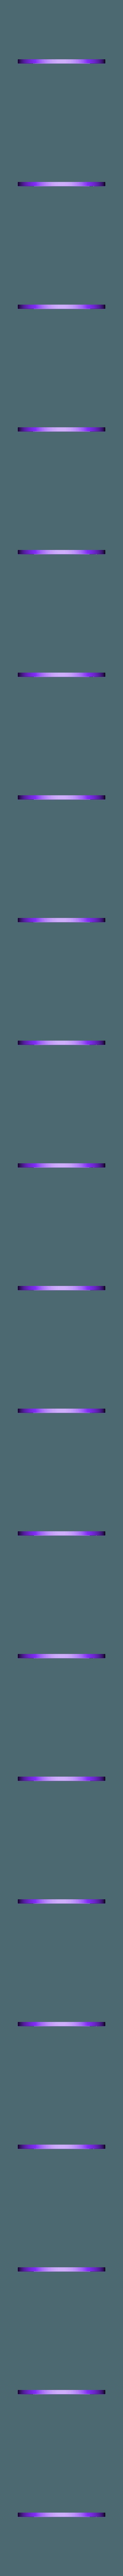 nets_black.STL Download free STL file Minimal Multi-color NBA coasters • 3D print object, MosaicManufacturing